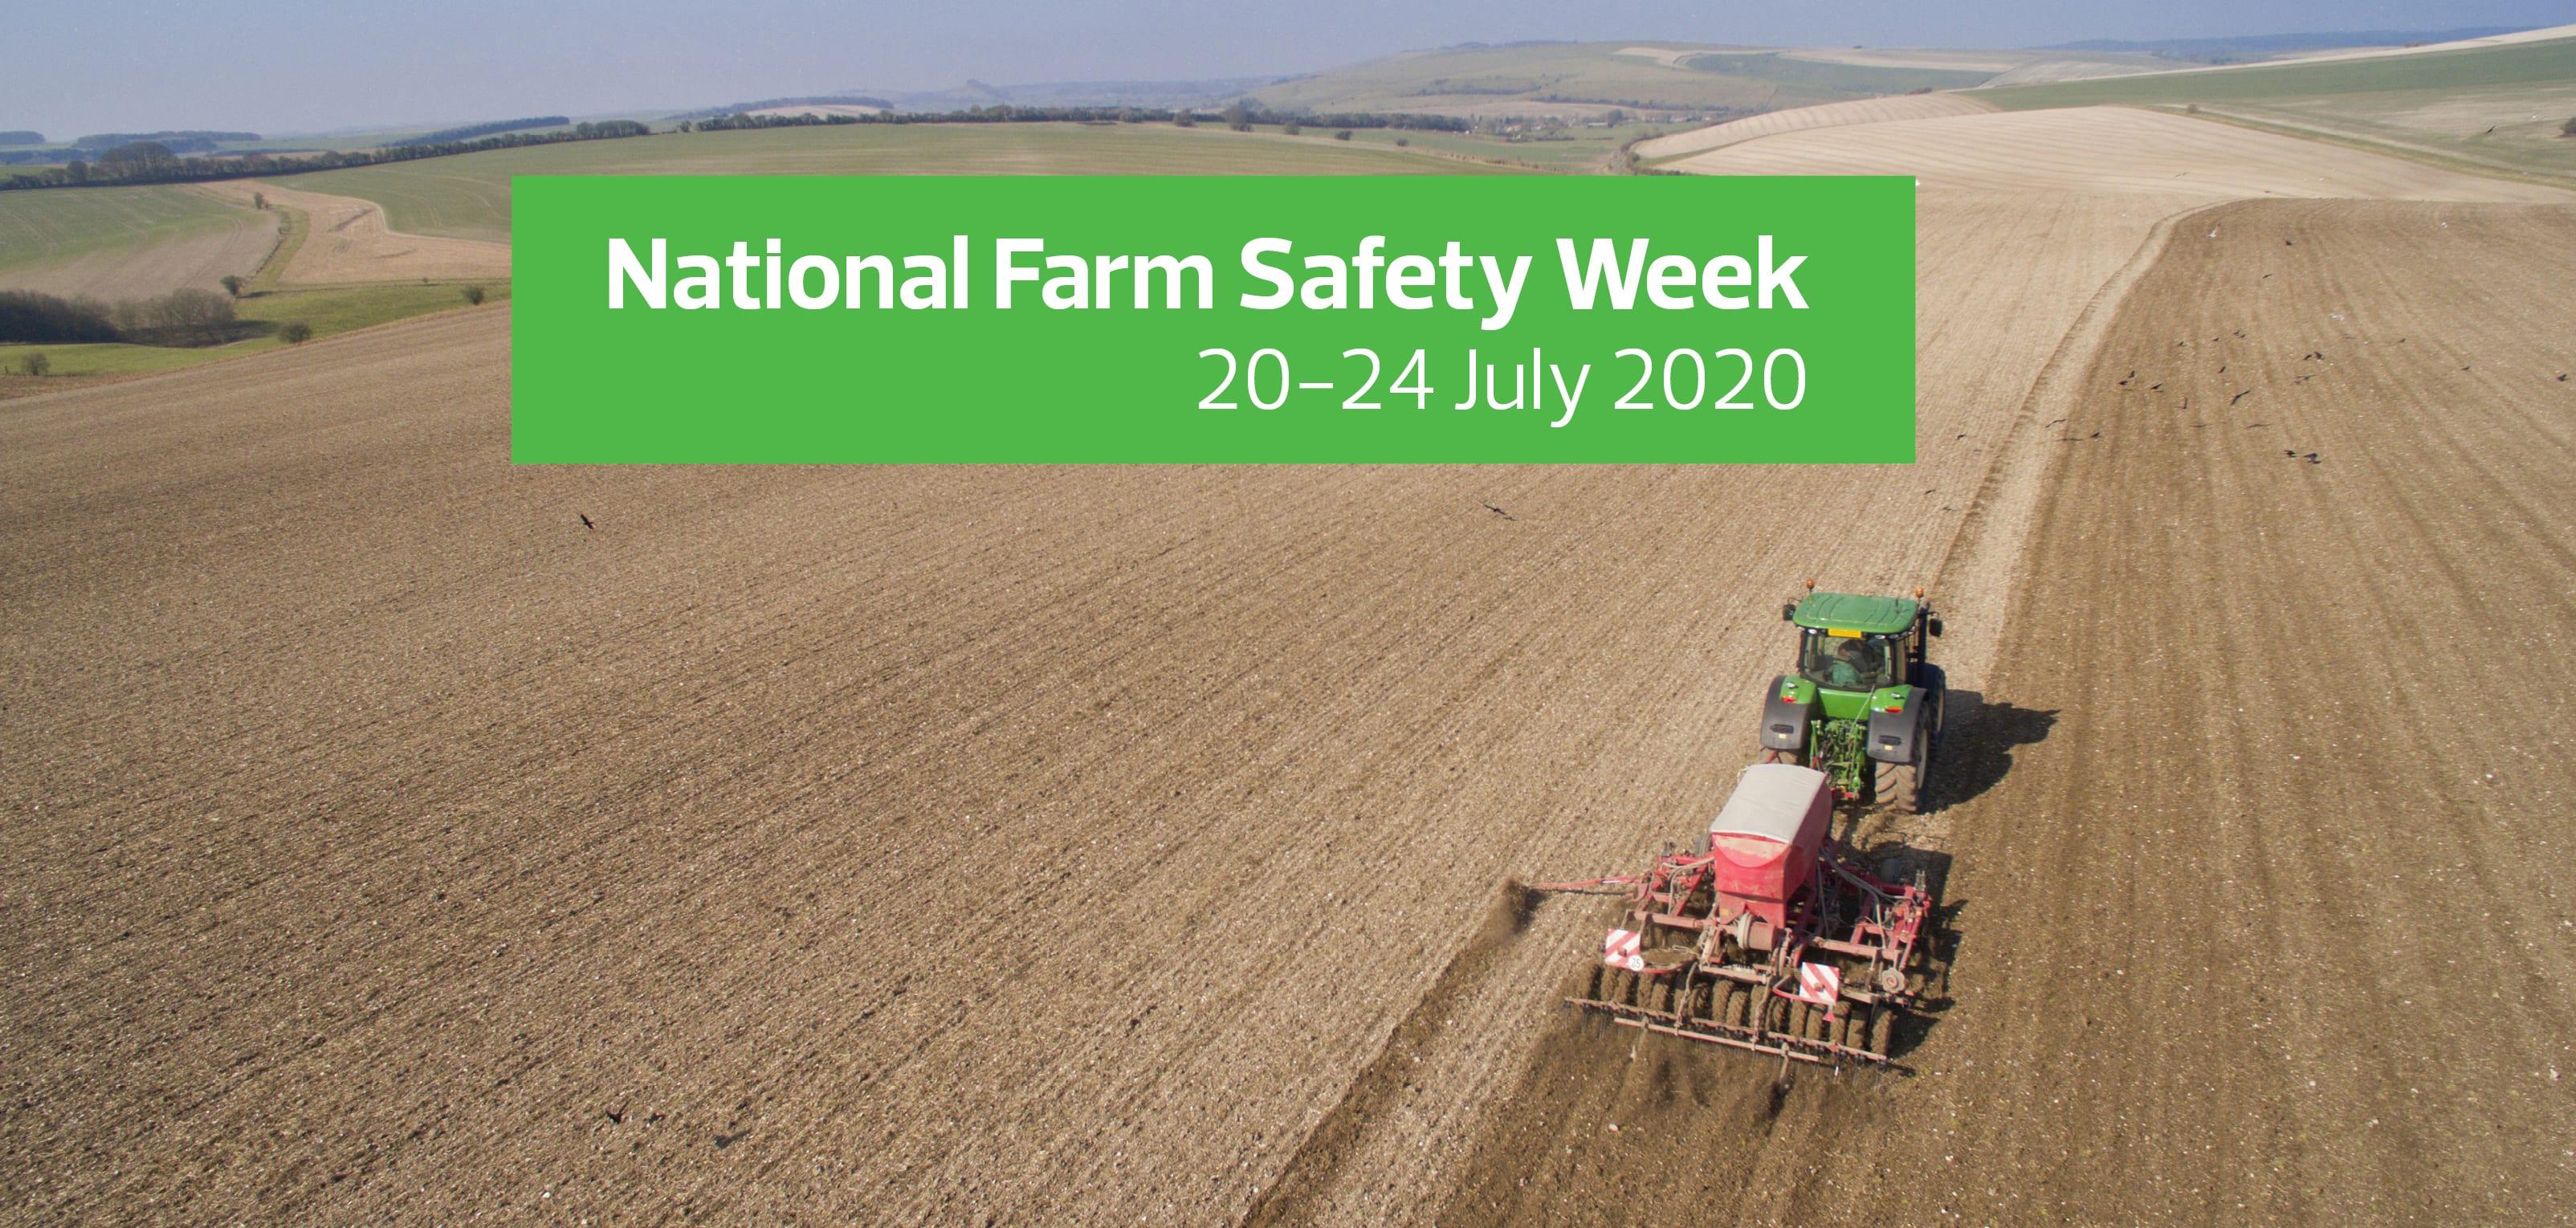 public://media/Article Thumbnail Images/2020-07-17_nat_farm_safety_week_article_thumbnail.jpg